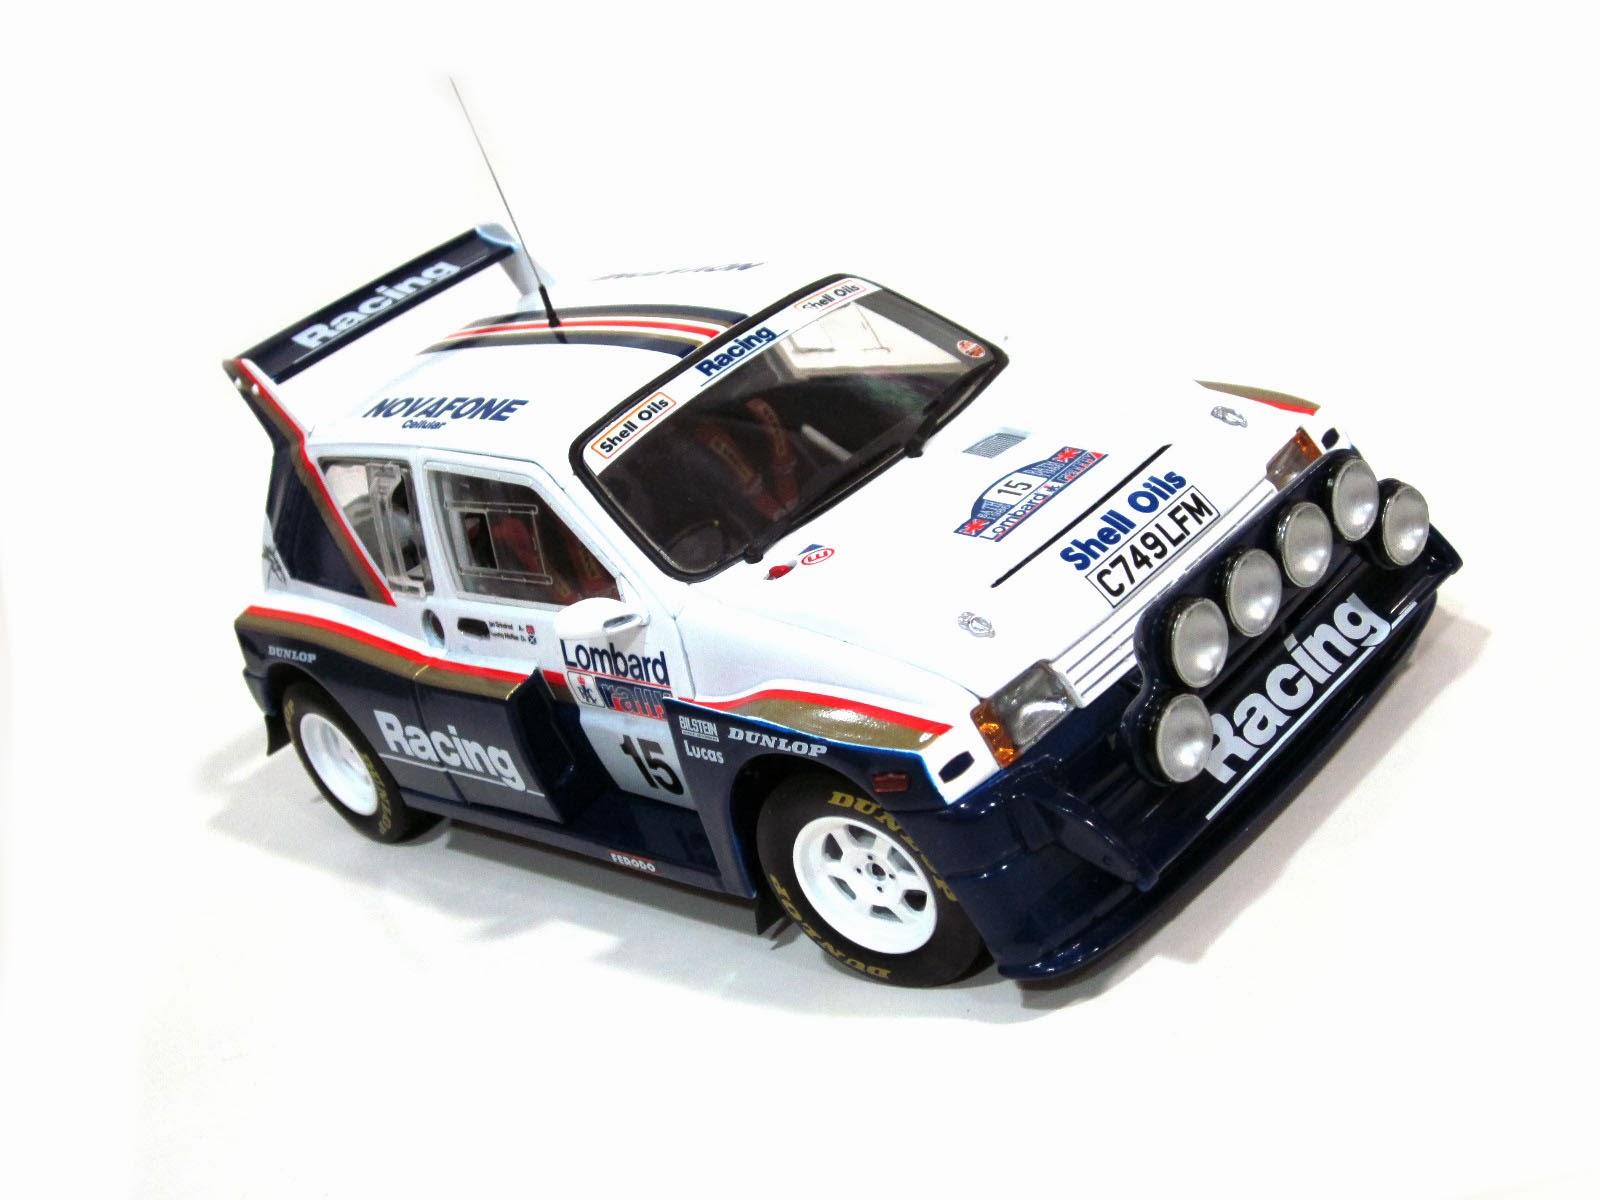 MG Metro 6R4 - RAC Rallye 1986 - Jimmy McRae & Ian Grindrod '86 - SunStar